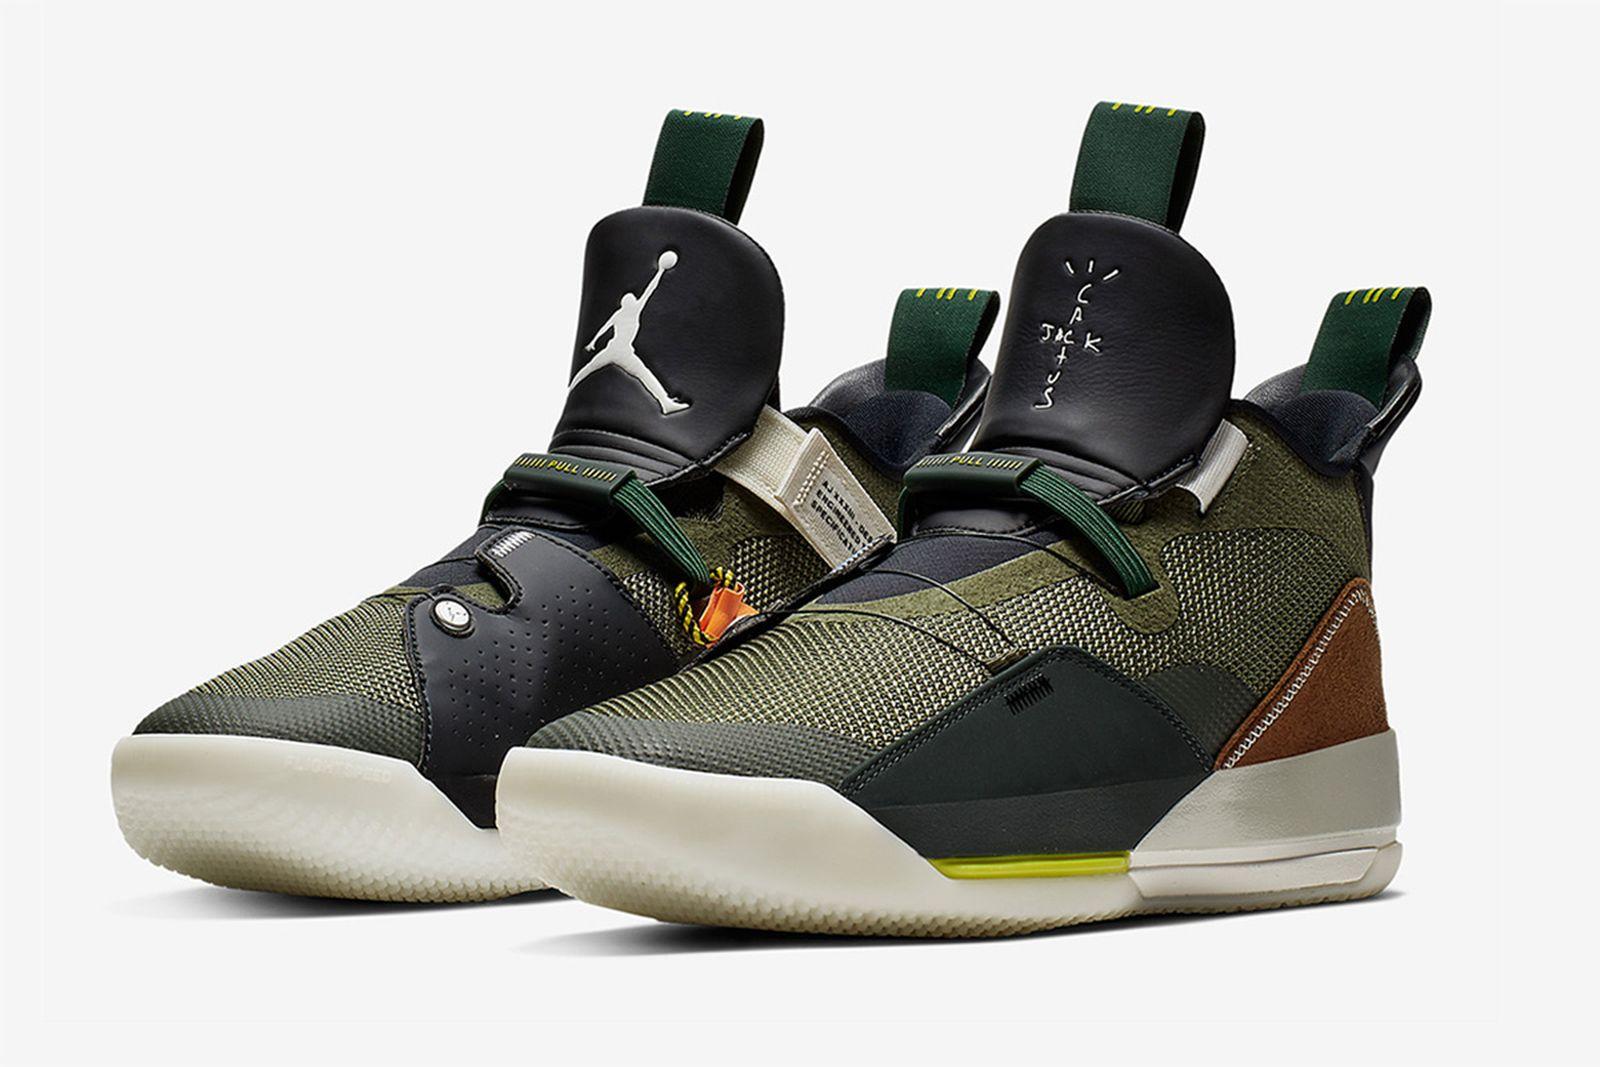 ravis scott sneaker collaboration history Air Jordan Nike Travis Scott